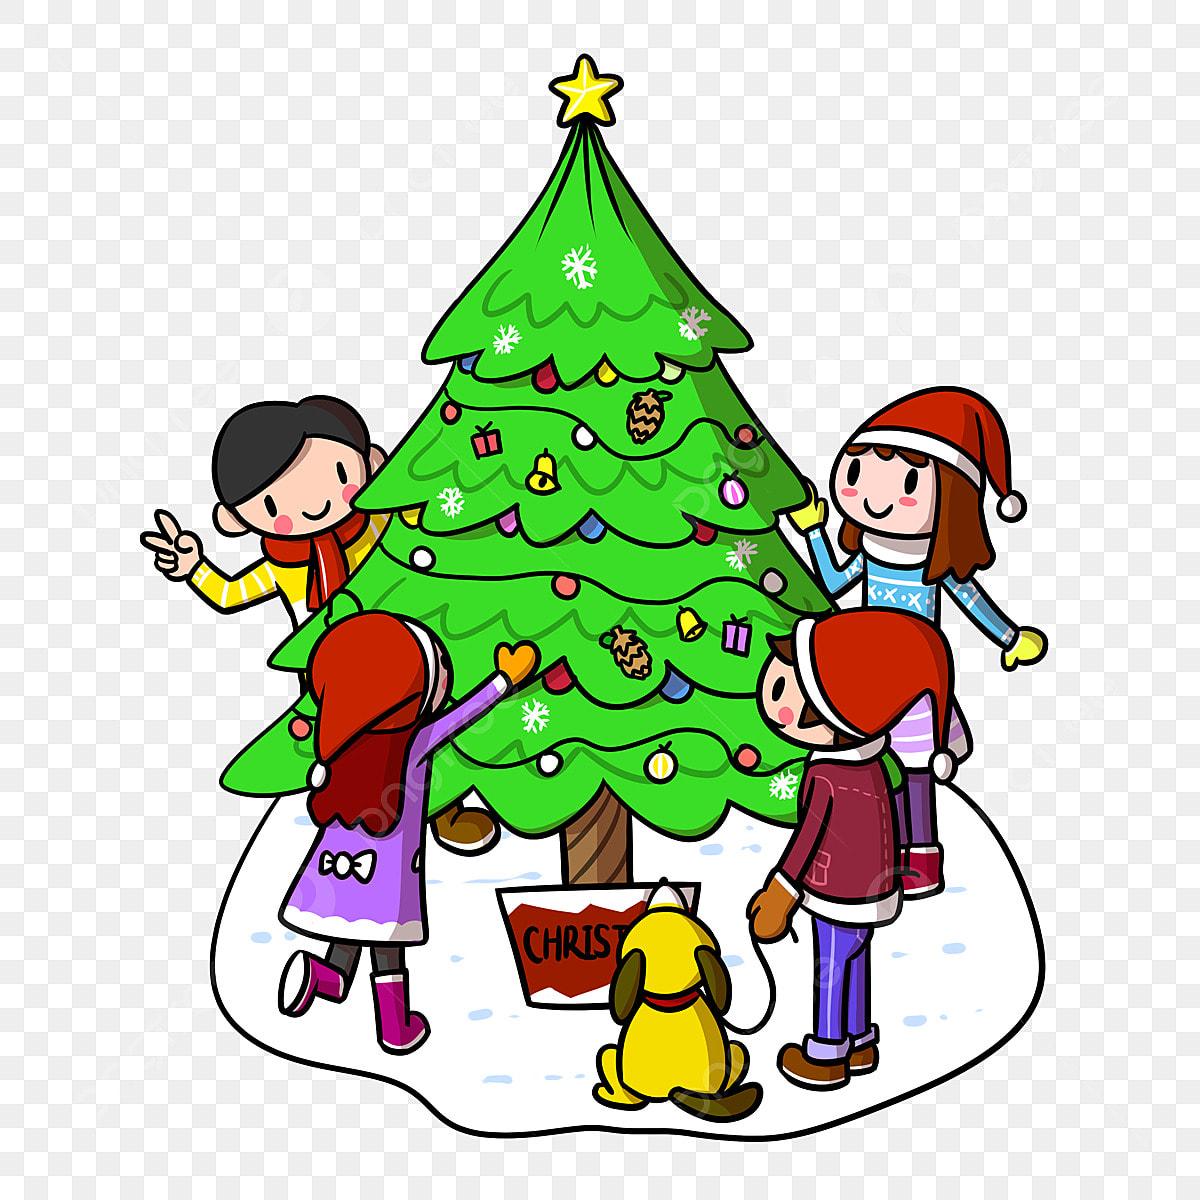 Dibujos Animados Navidad Navidad Navidad Navidad Animados